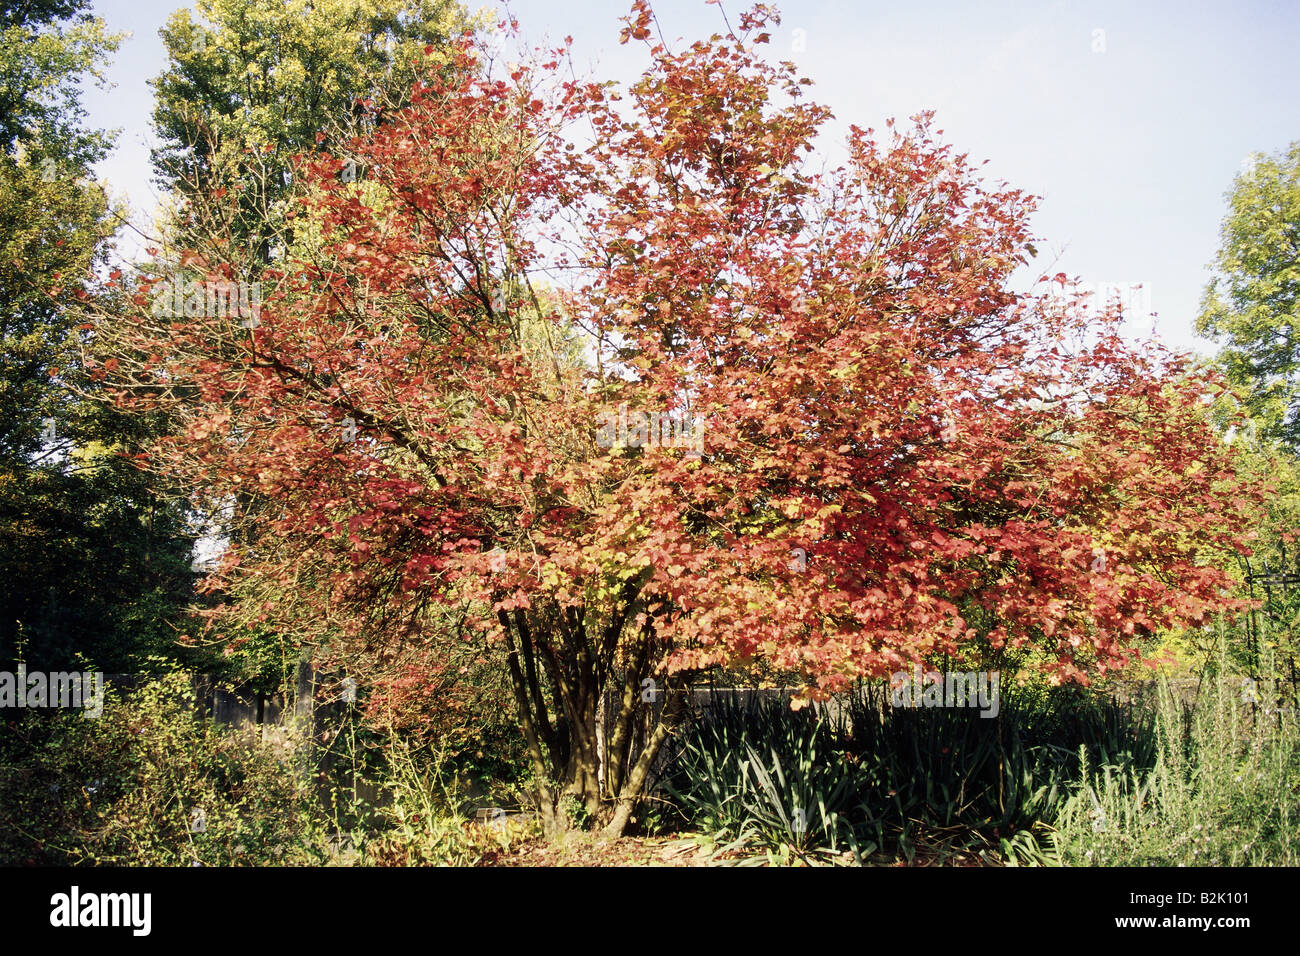 botany, Viburnum, Wayfaring Tree, (Viburnum lantana),  Asteridae, Dipsacales, Adoxaceae, caprifoliaceae, Additional Stock Photo